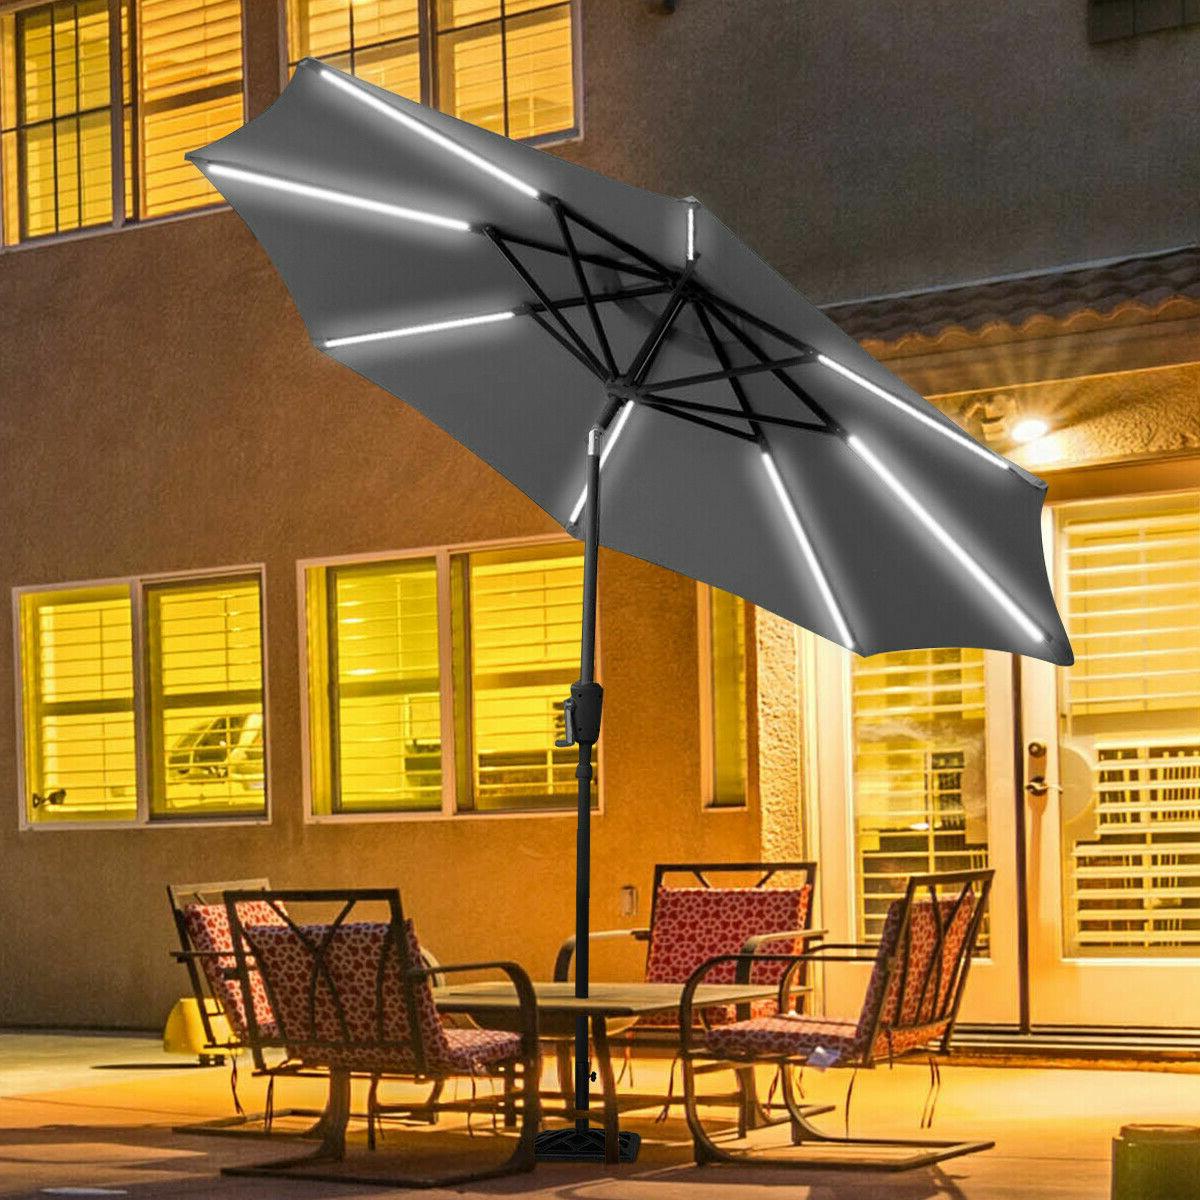 Fashionable Sinclair 9' Patio Led Light Market Umbrella Pertaining To Harwich Market Umbrellas (View 5 of 20)